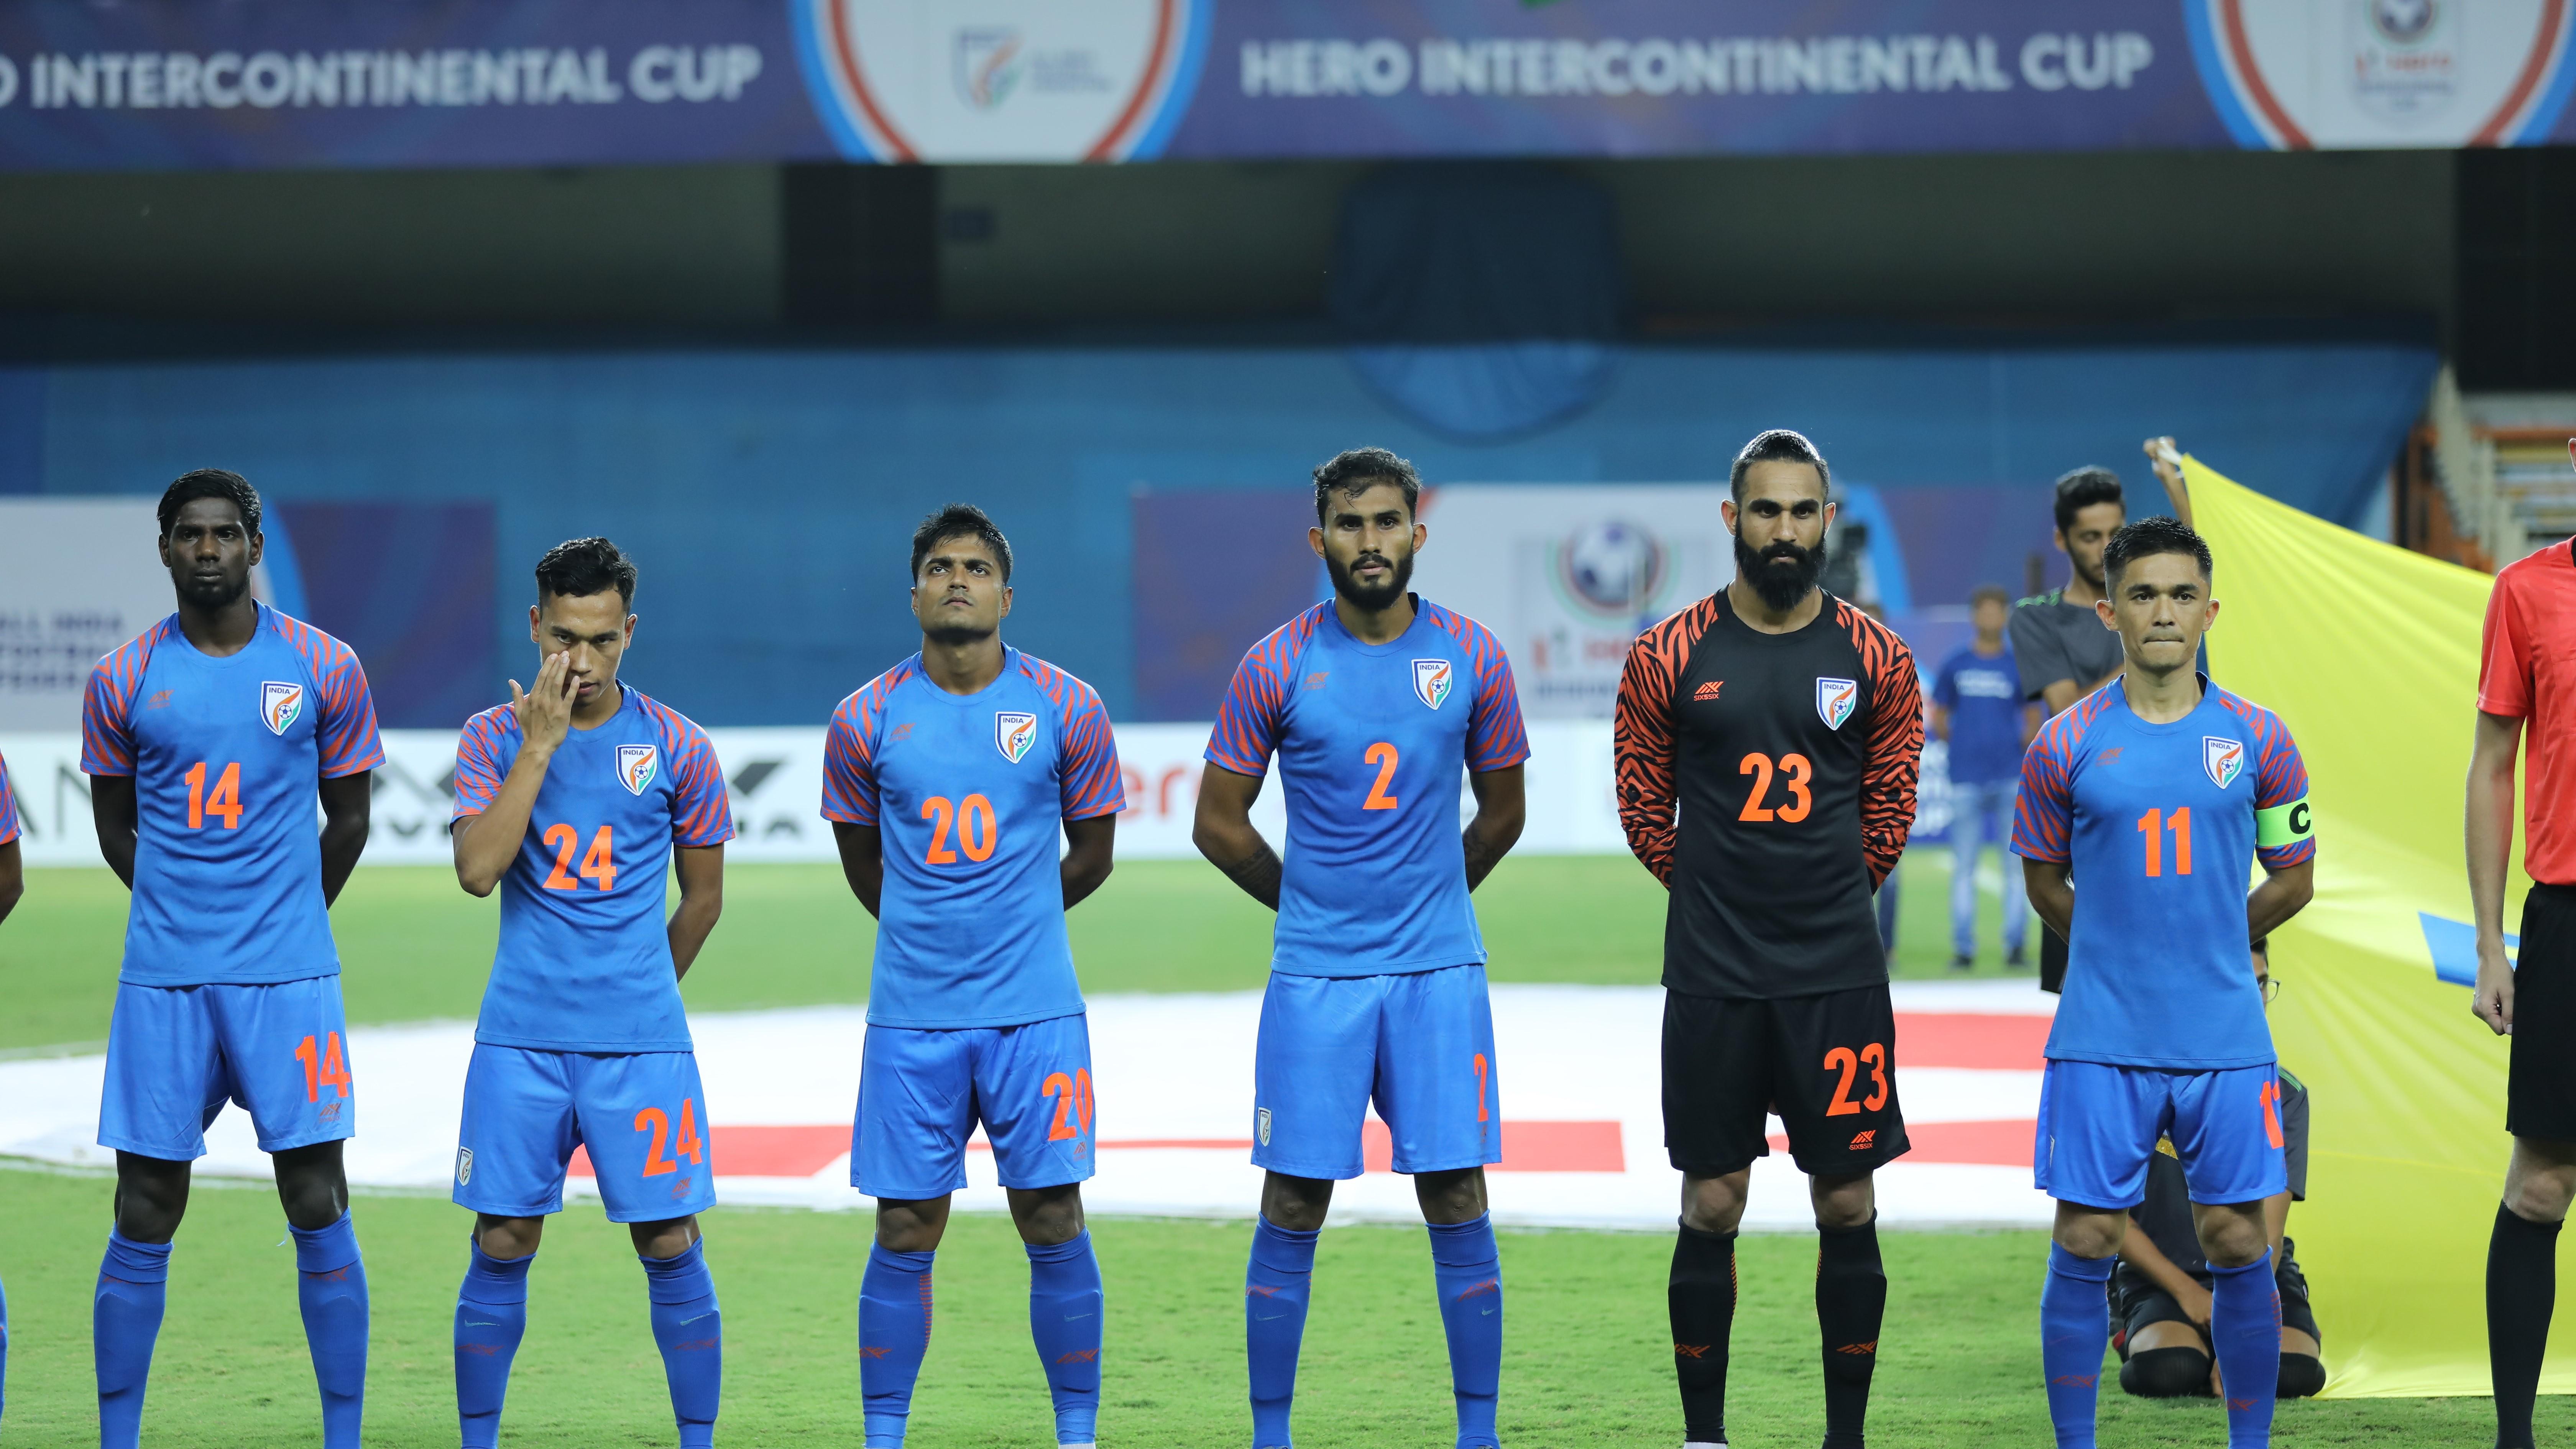 Intercontinental Cup 2019: Organizational experimentation